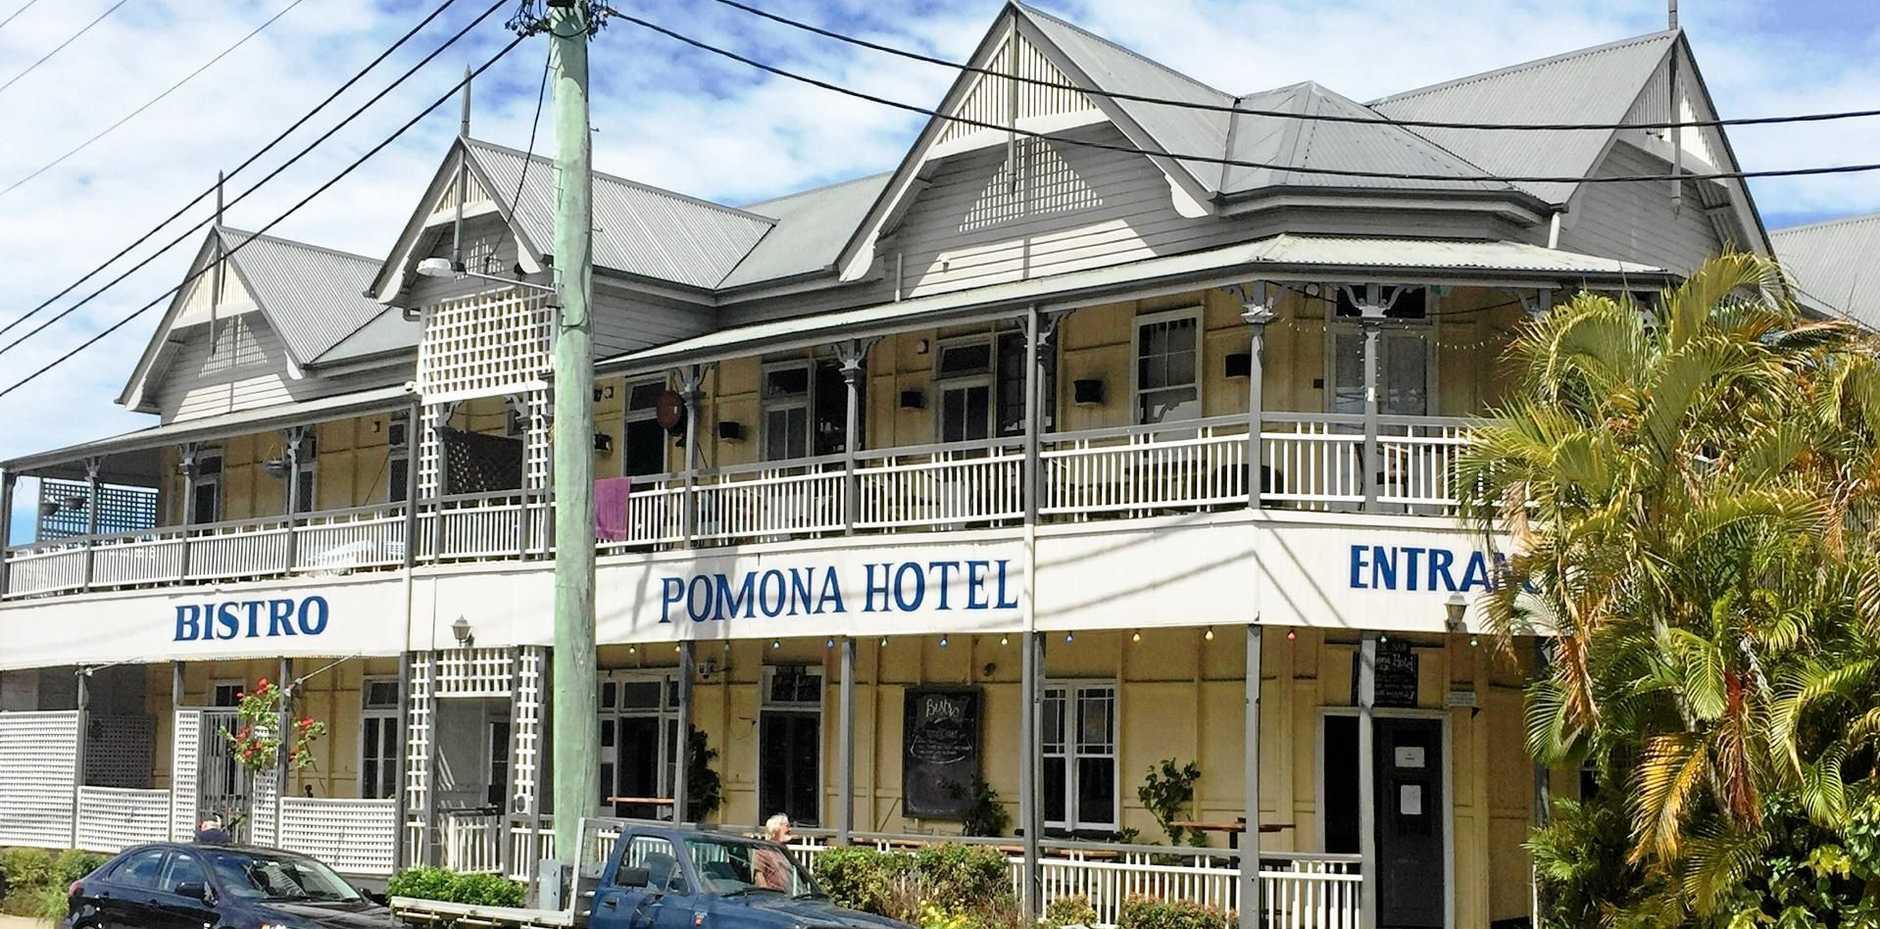 A classic Queenslander pub, the Pomona Hotel.